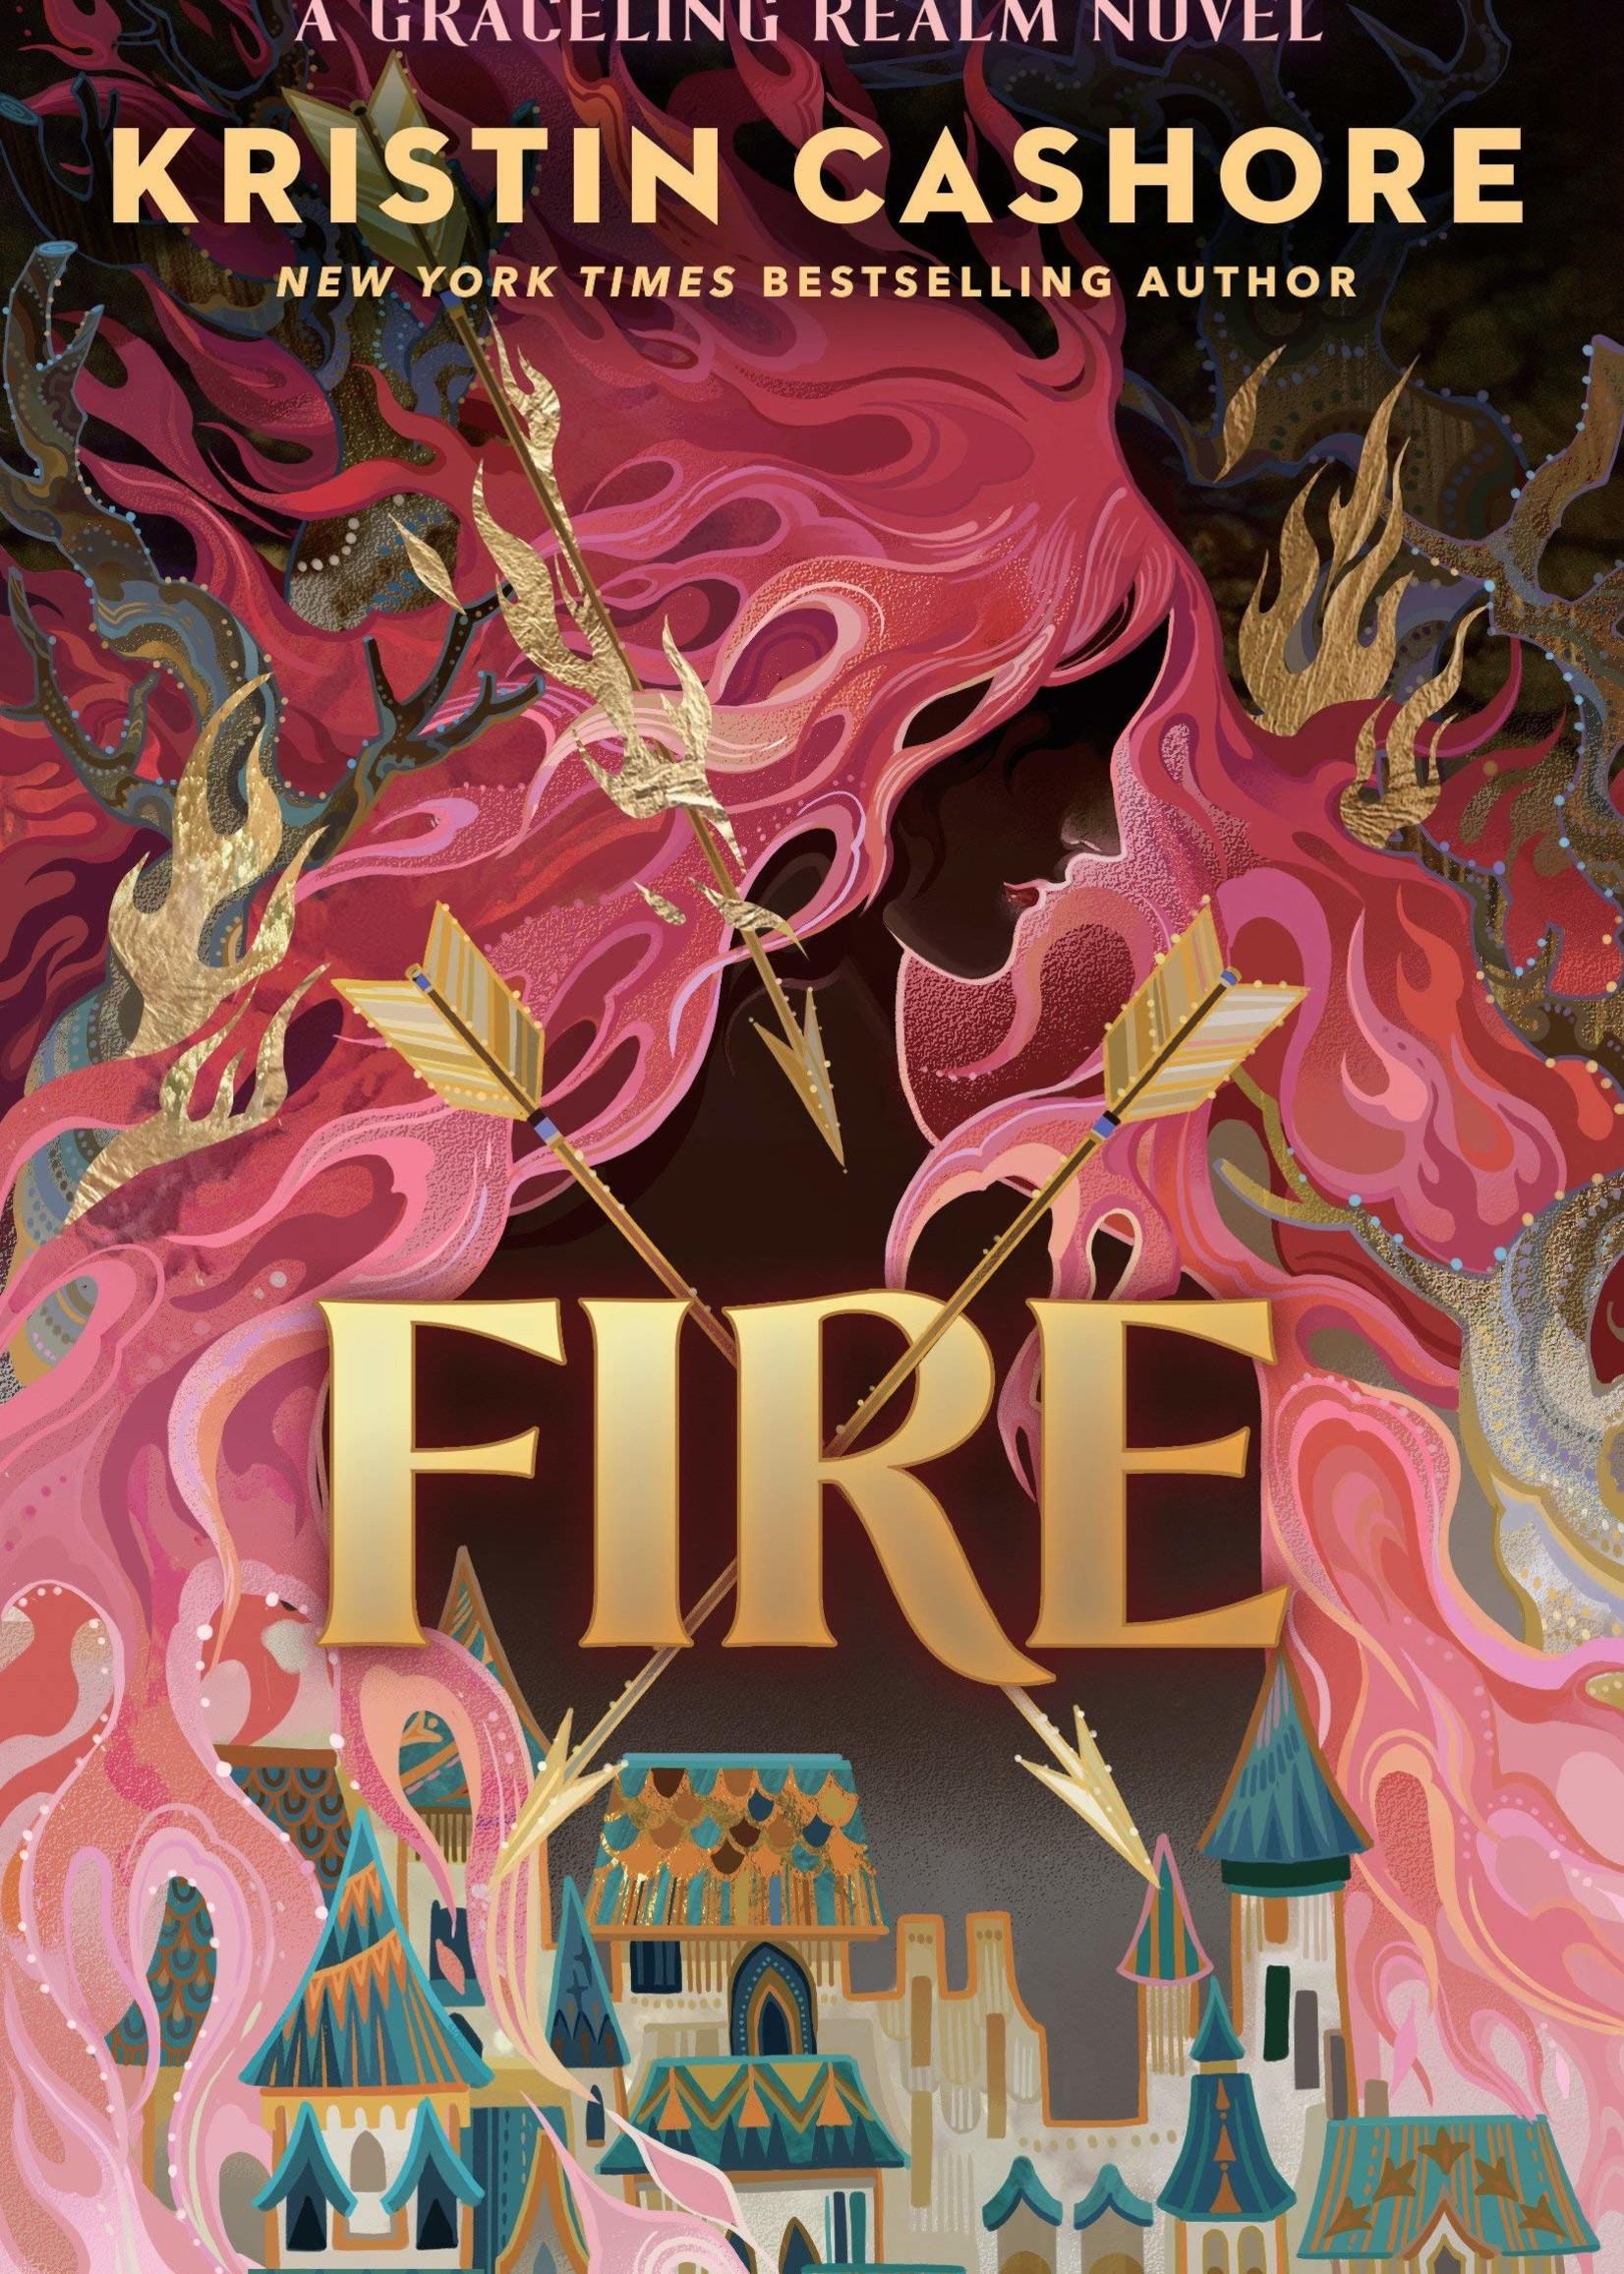 Graceling Realm #02, Fire - Paperback